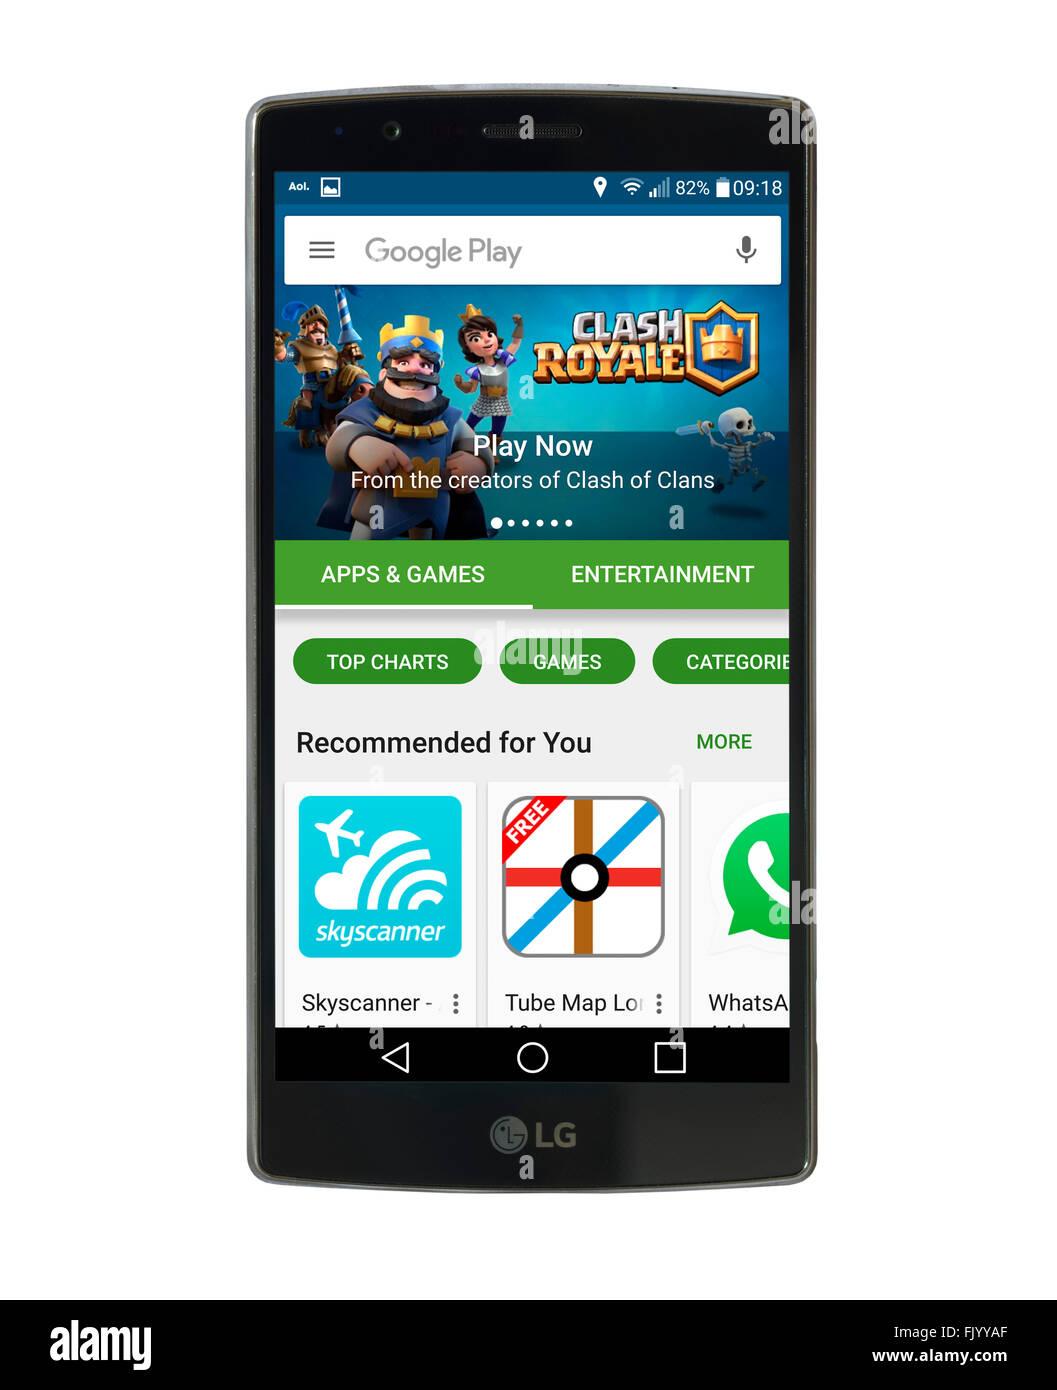 Google Play Store en un LG G4 5,5 pulgadas smartphone Android Imagen De Stock